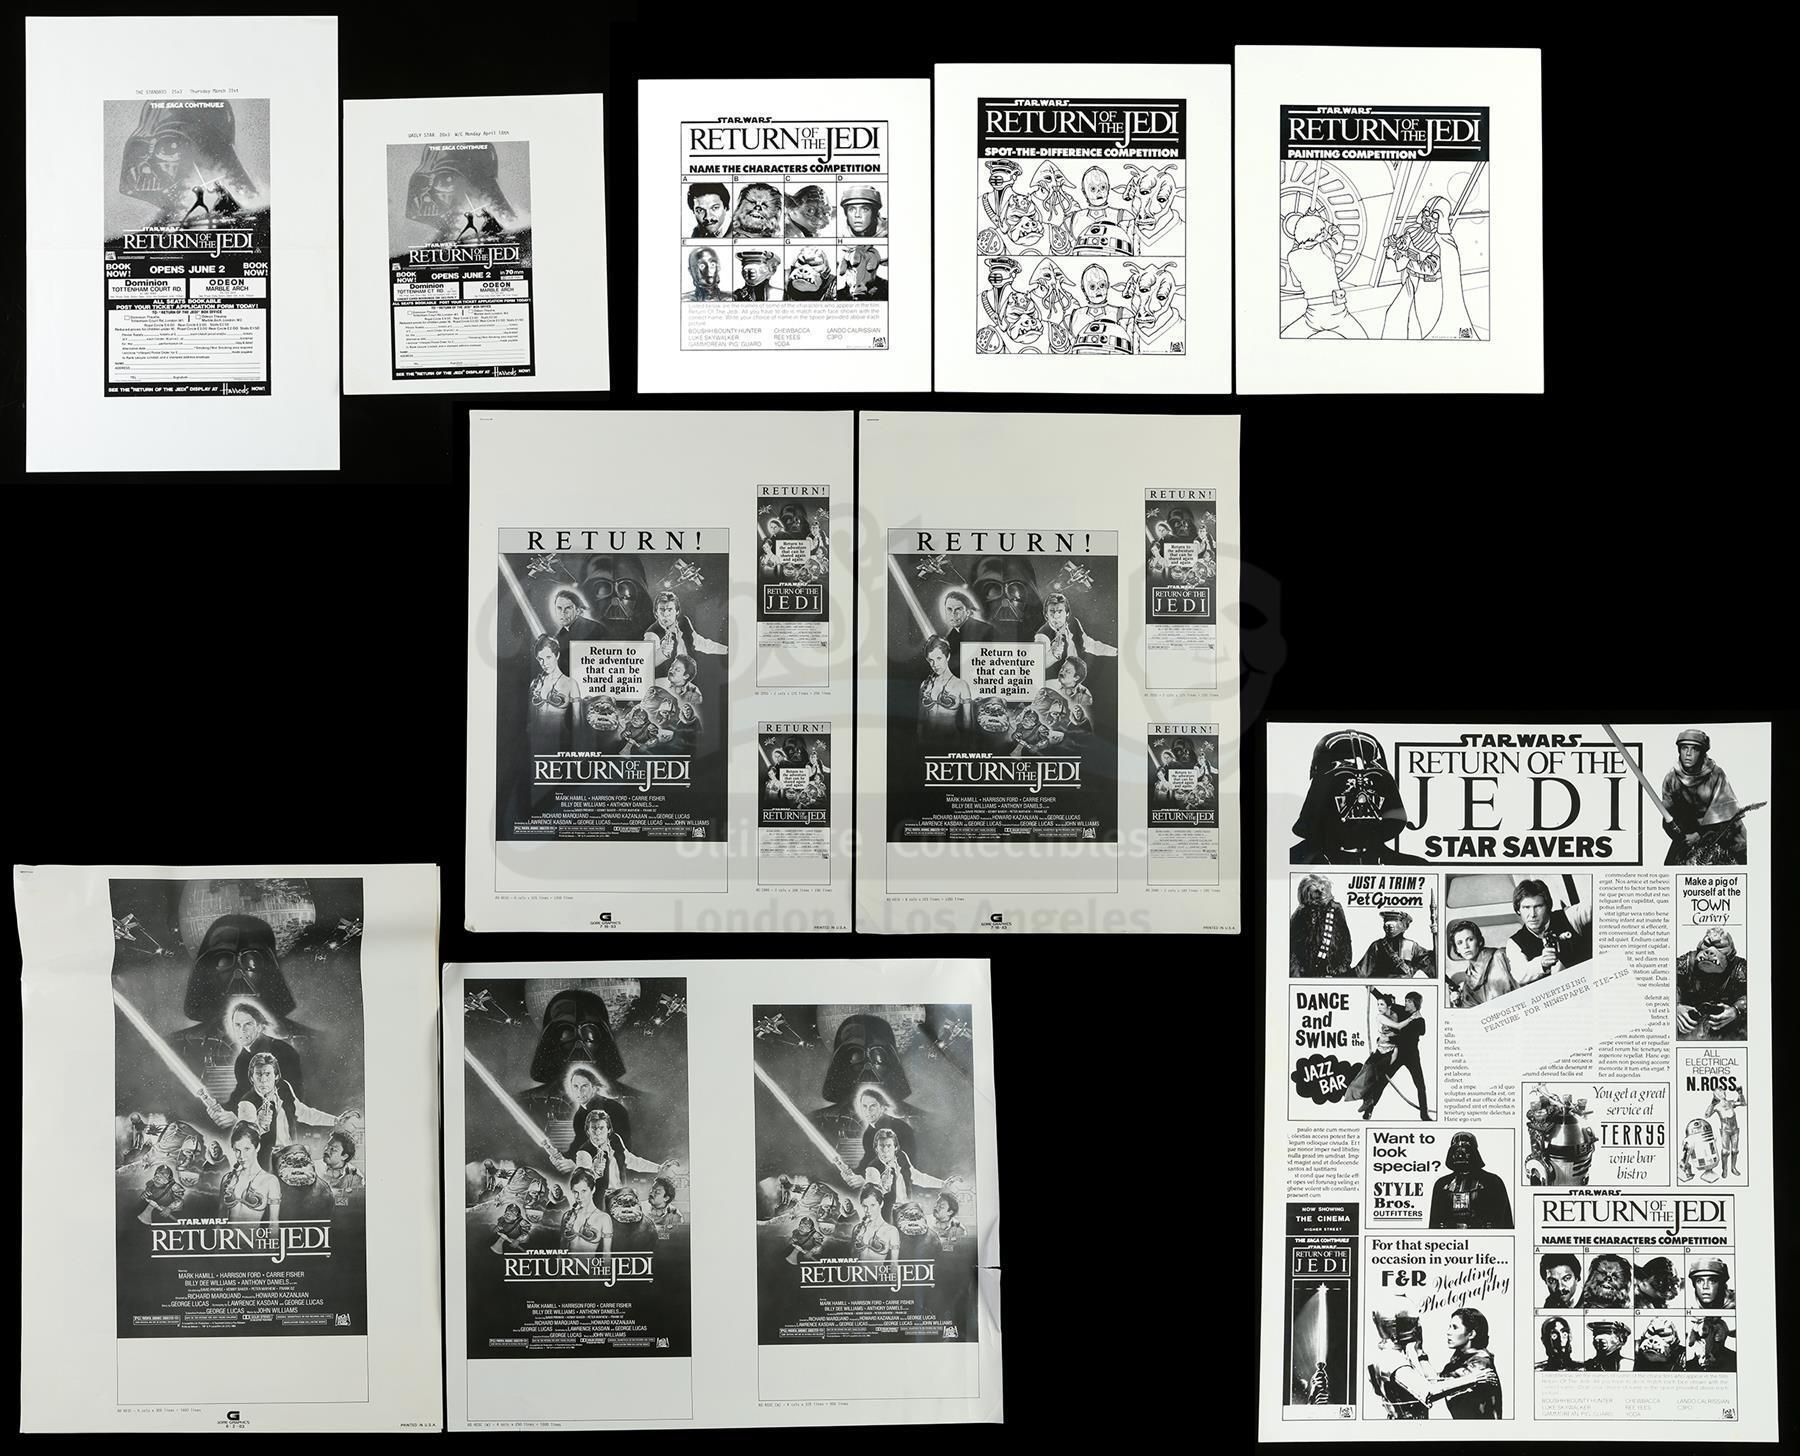 Lot # 1215: STAR WARS - EP VI - RETURN OF THE JEDI - Set of Ad Slicks and Promo Proofs